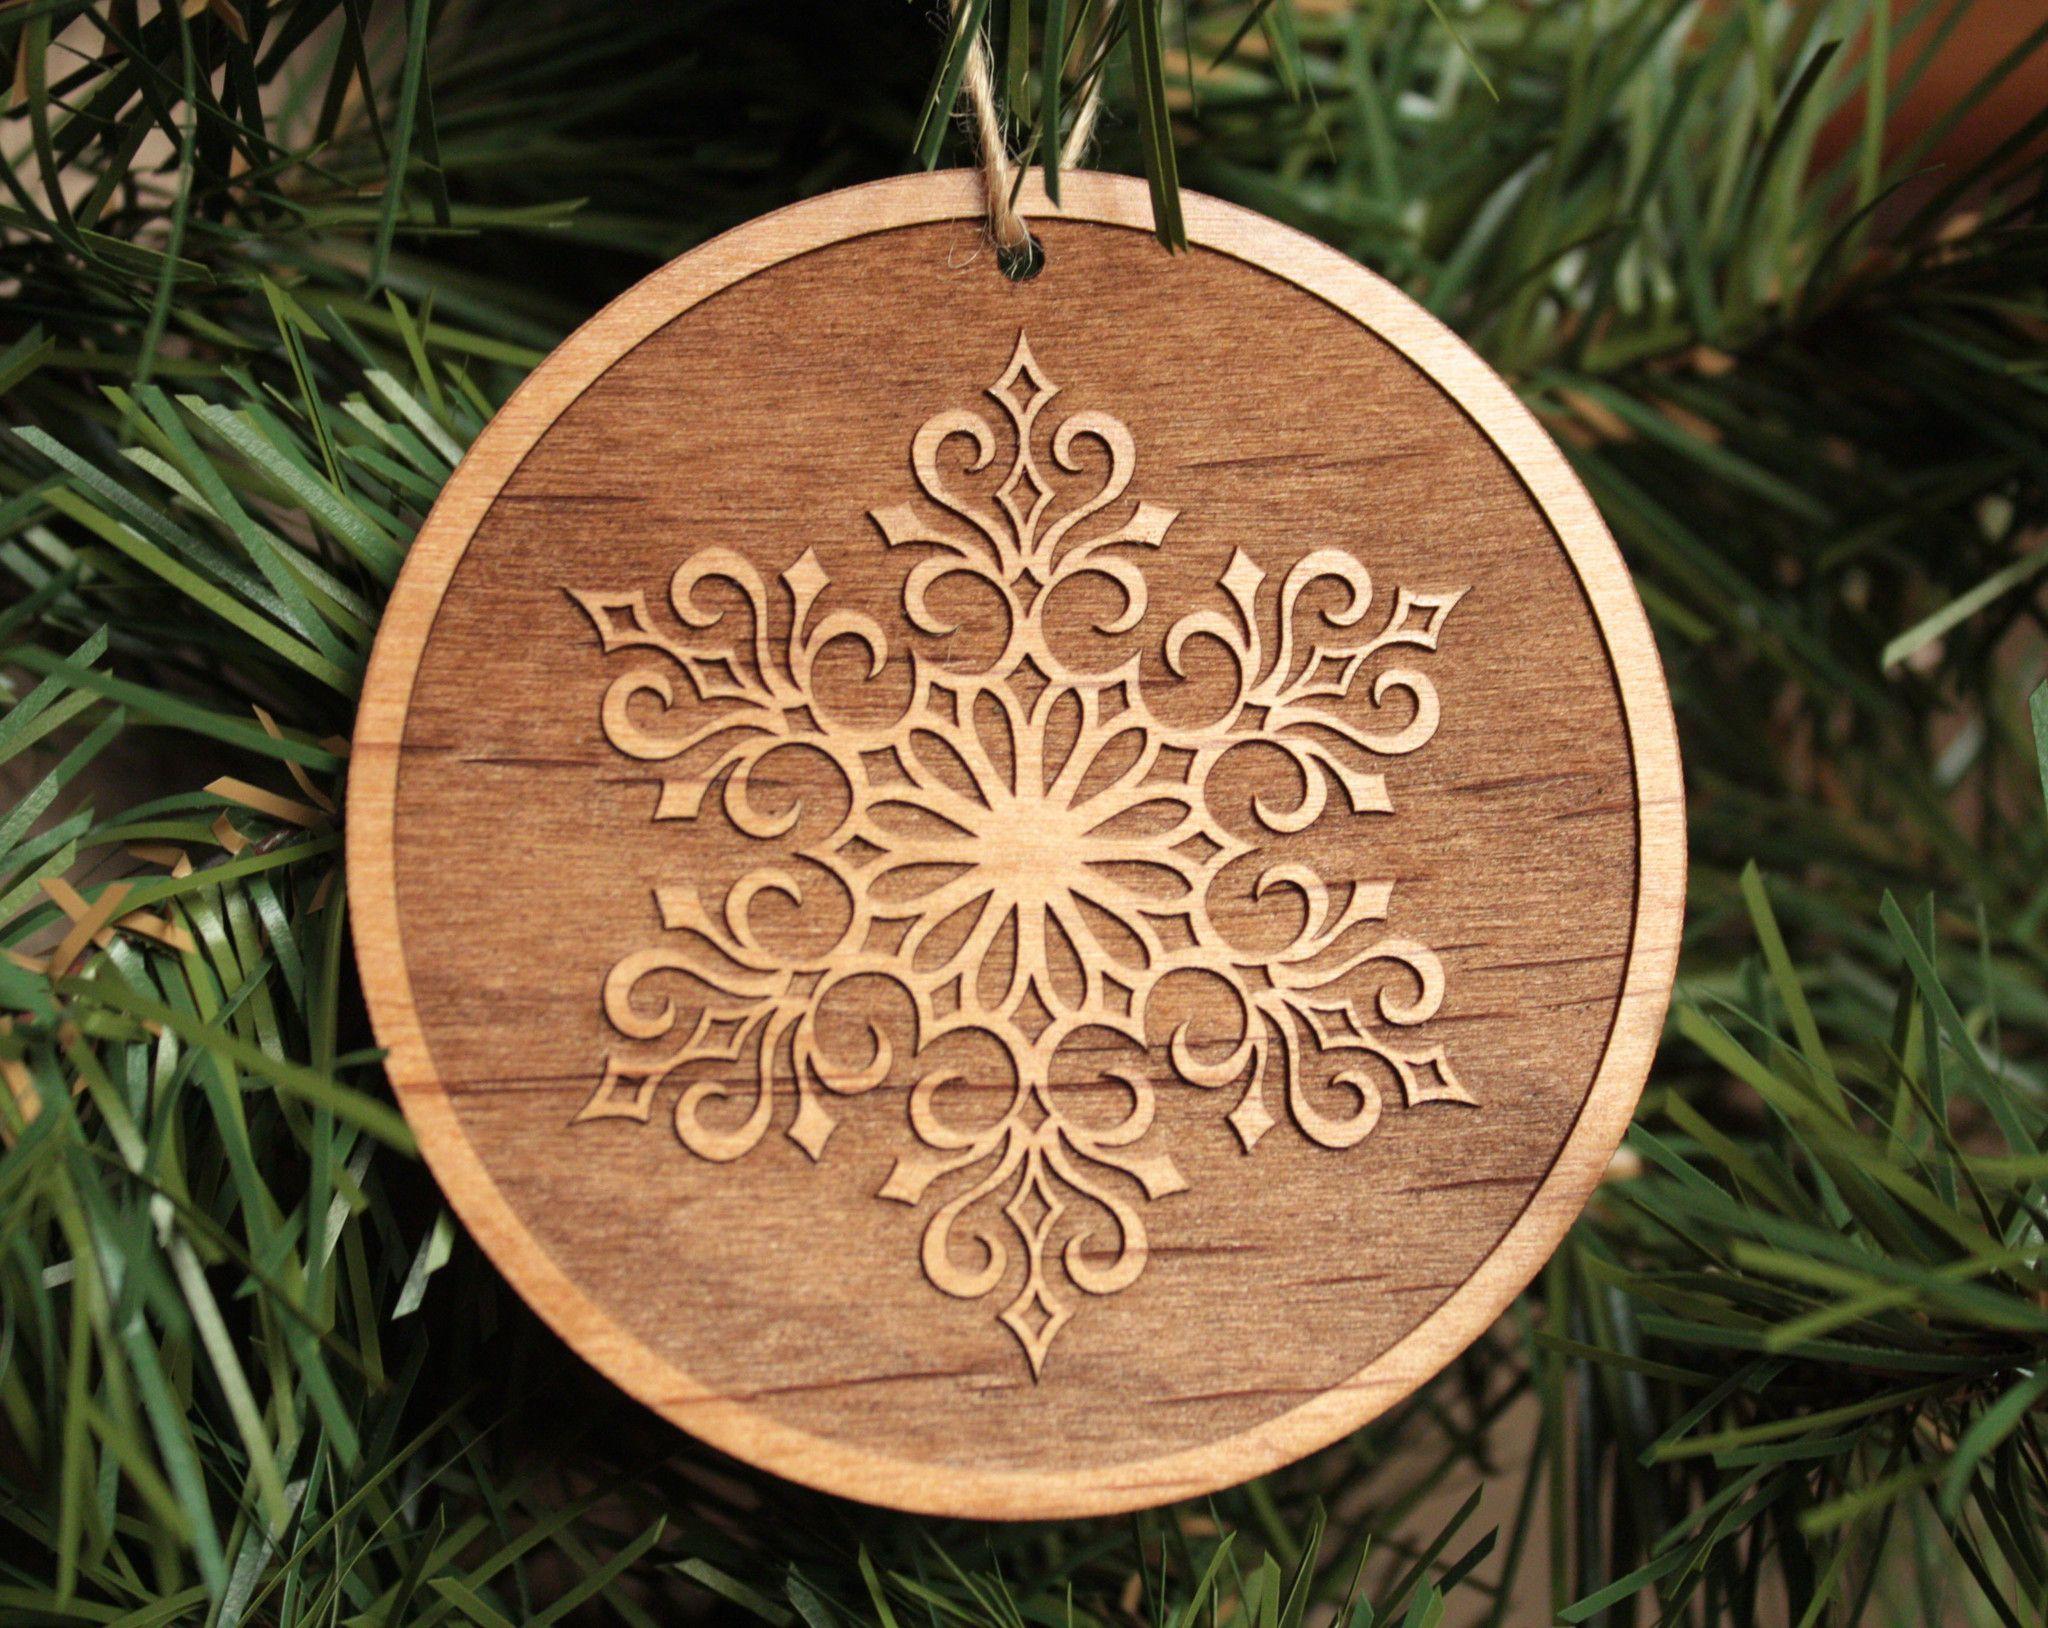 Wooden Snowflake Ornaments Christmas Decorations Unique Christmas Ornaments Wooden Christmas Trees Christmas Ornaments To Make